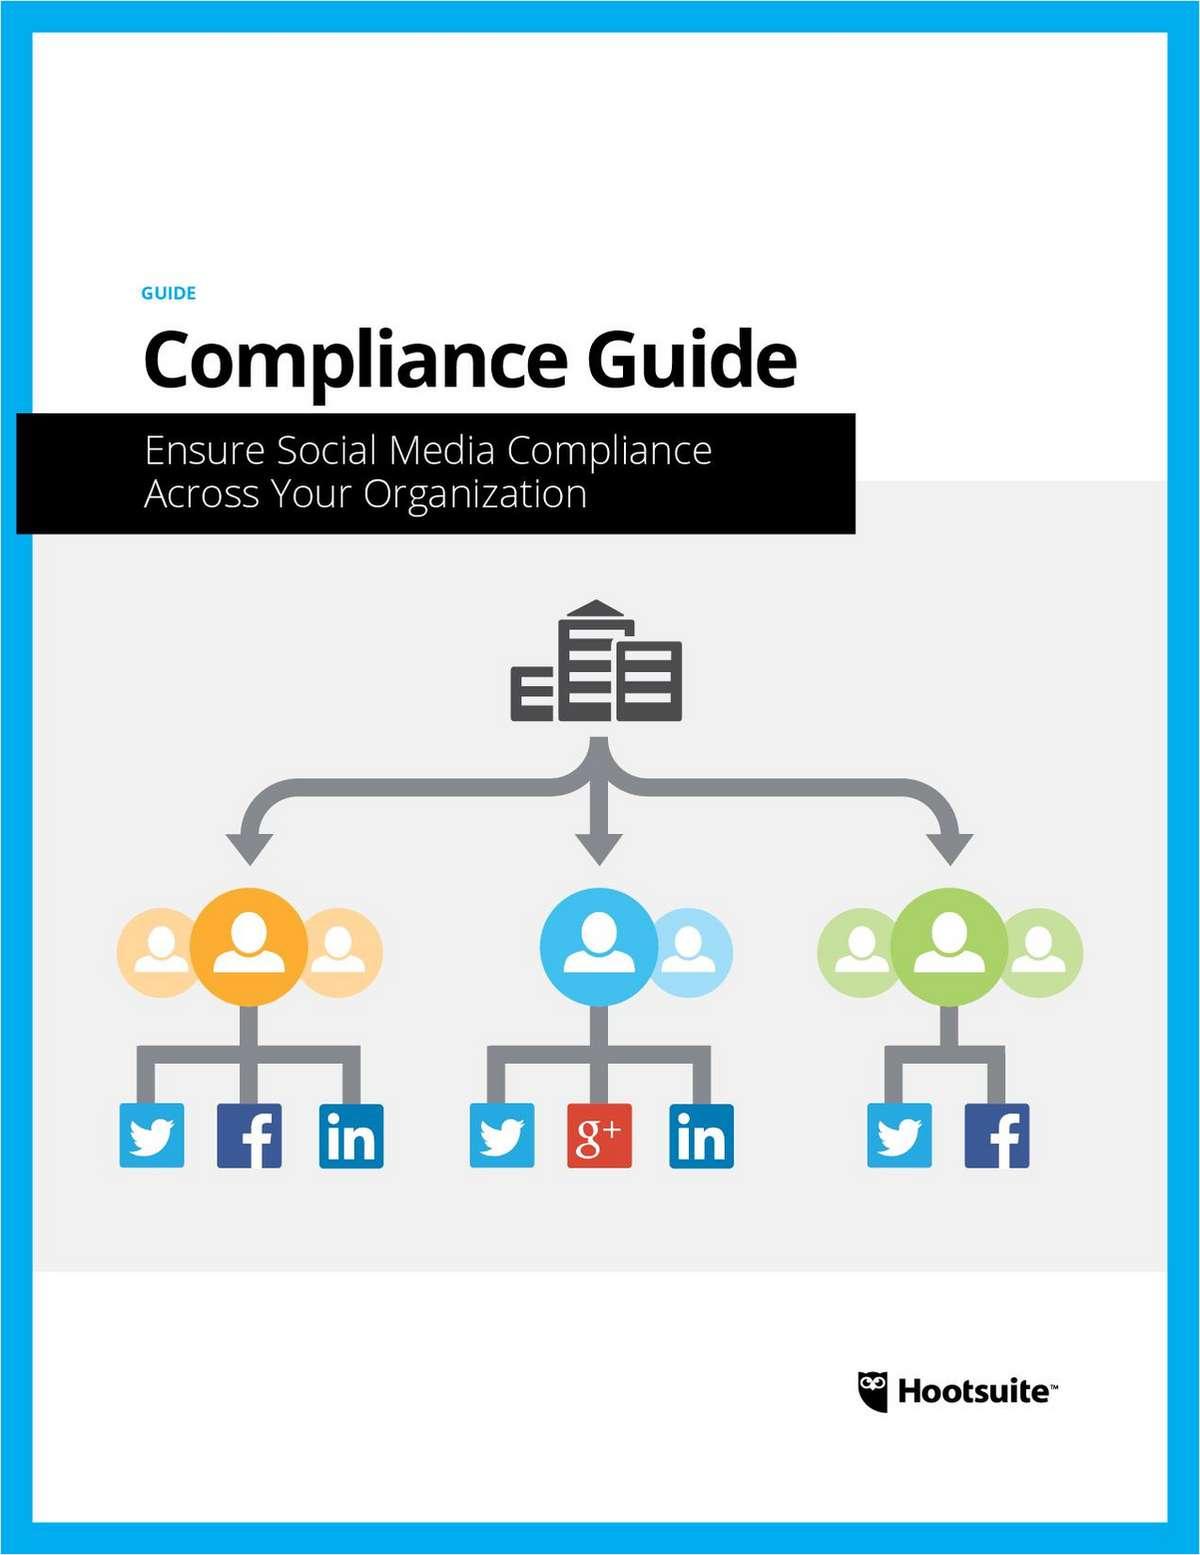 Ensure Social Media Compliance Across Your Organization